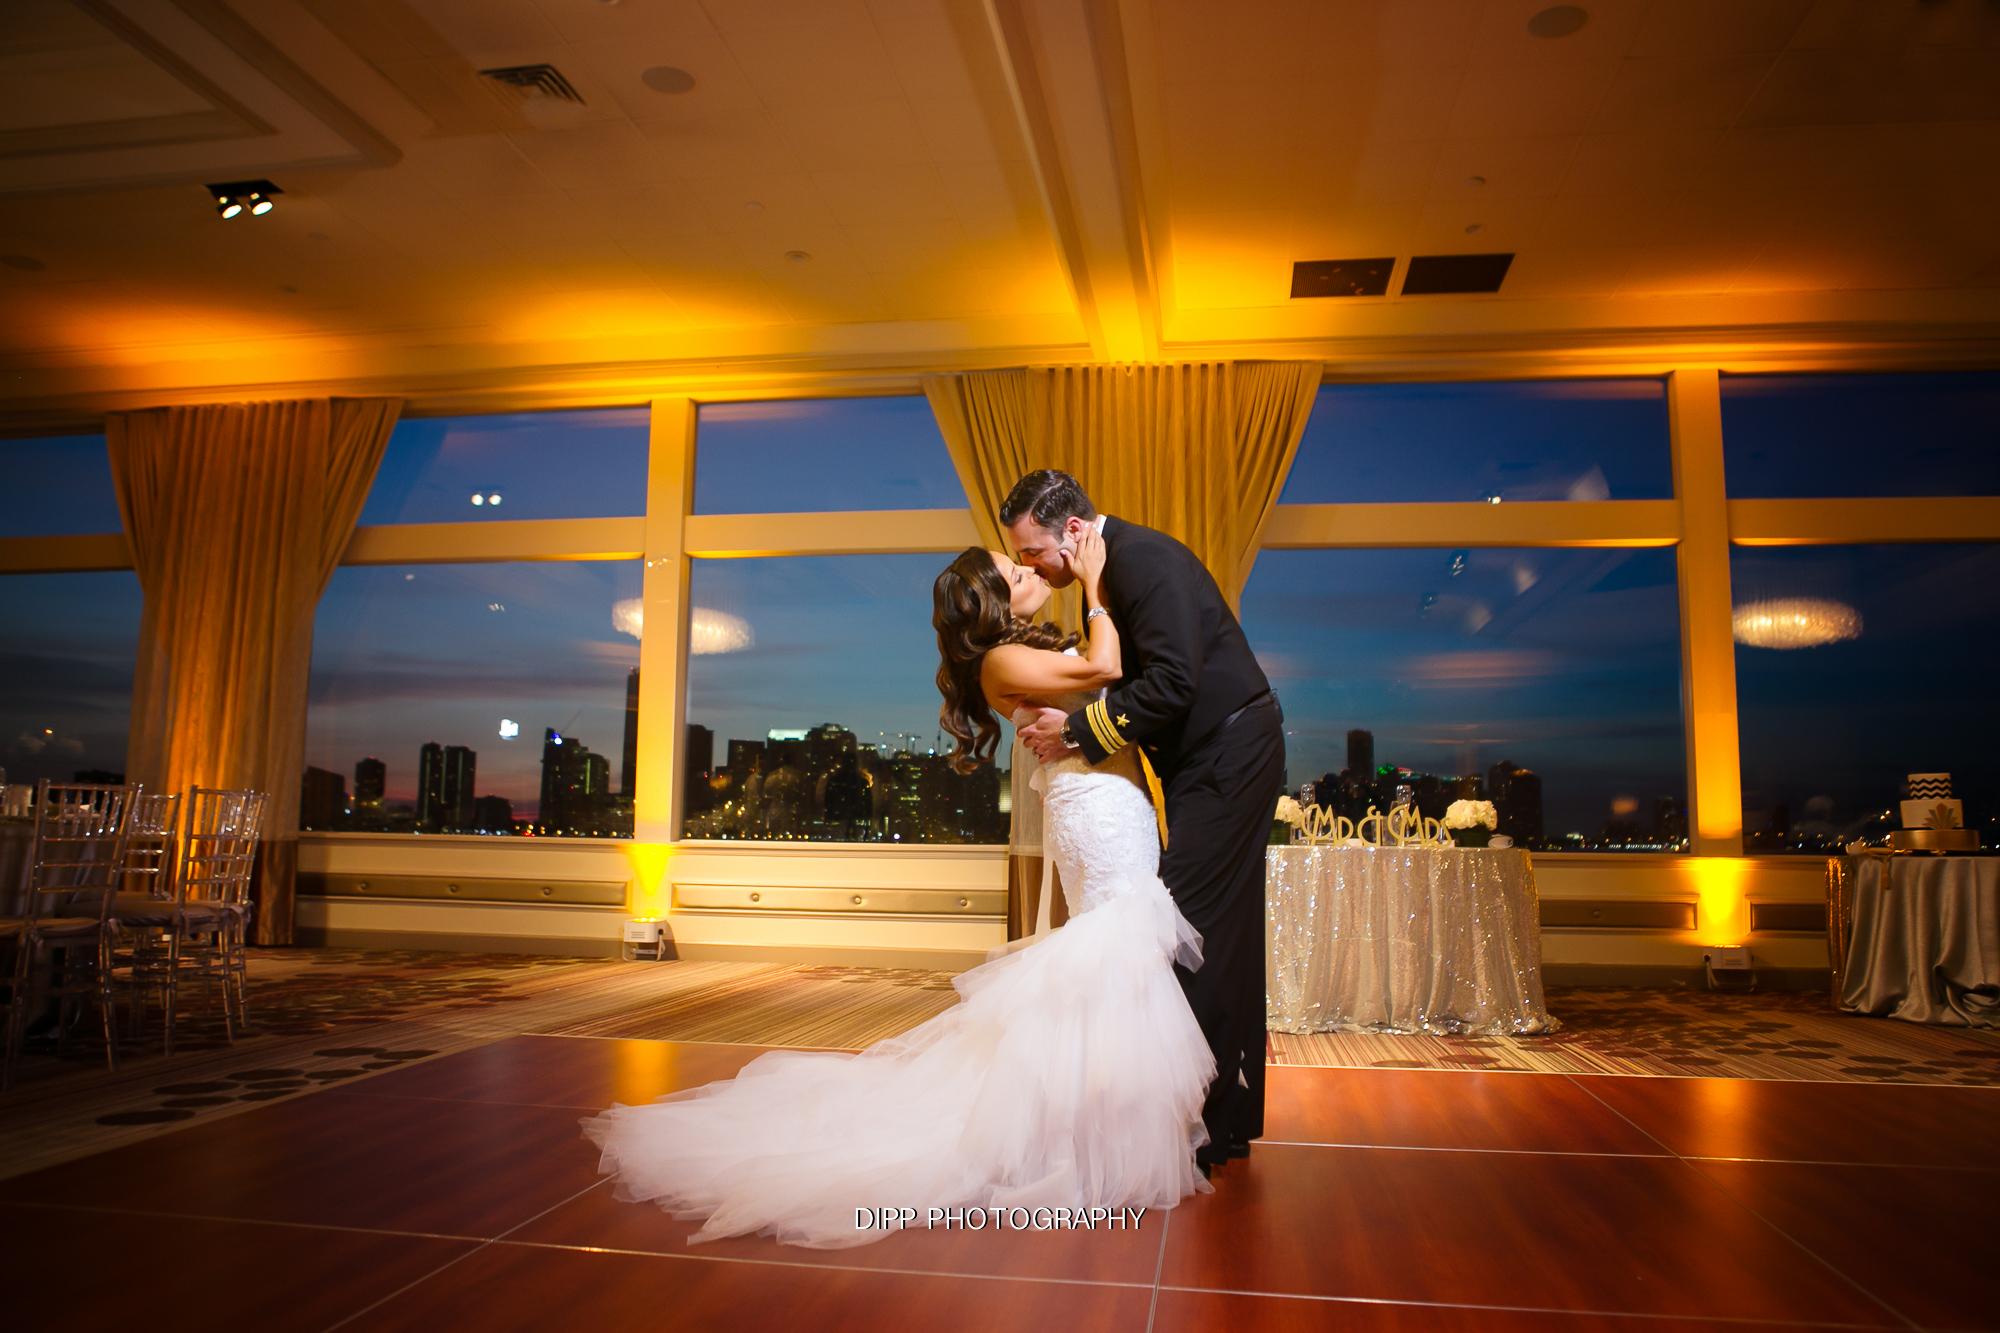 Dipp_2016 EDITED Sara & Brandon Wedding-367